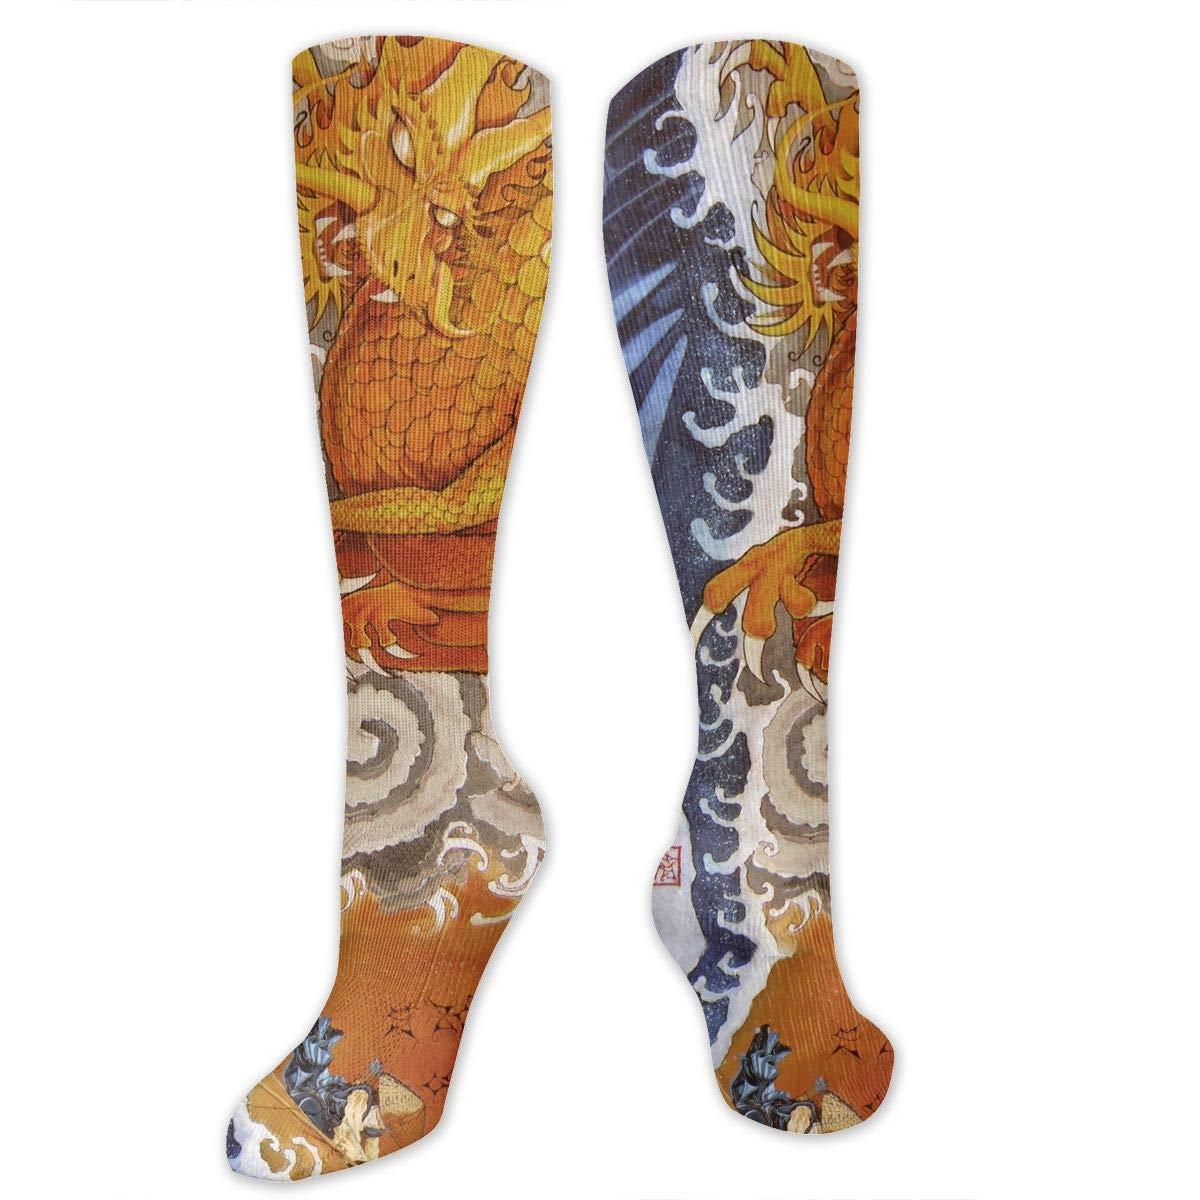 Chanwazibibiliu Japanese Mountain Sea Gold Dragon Mens Colorful Dress Socks Funky Men Multicolored Pattern Fashionable Fun Crew Cotton Socks